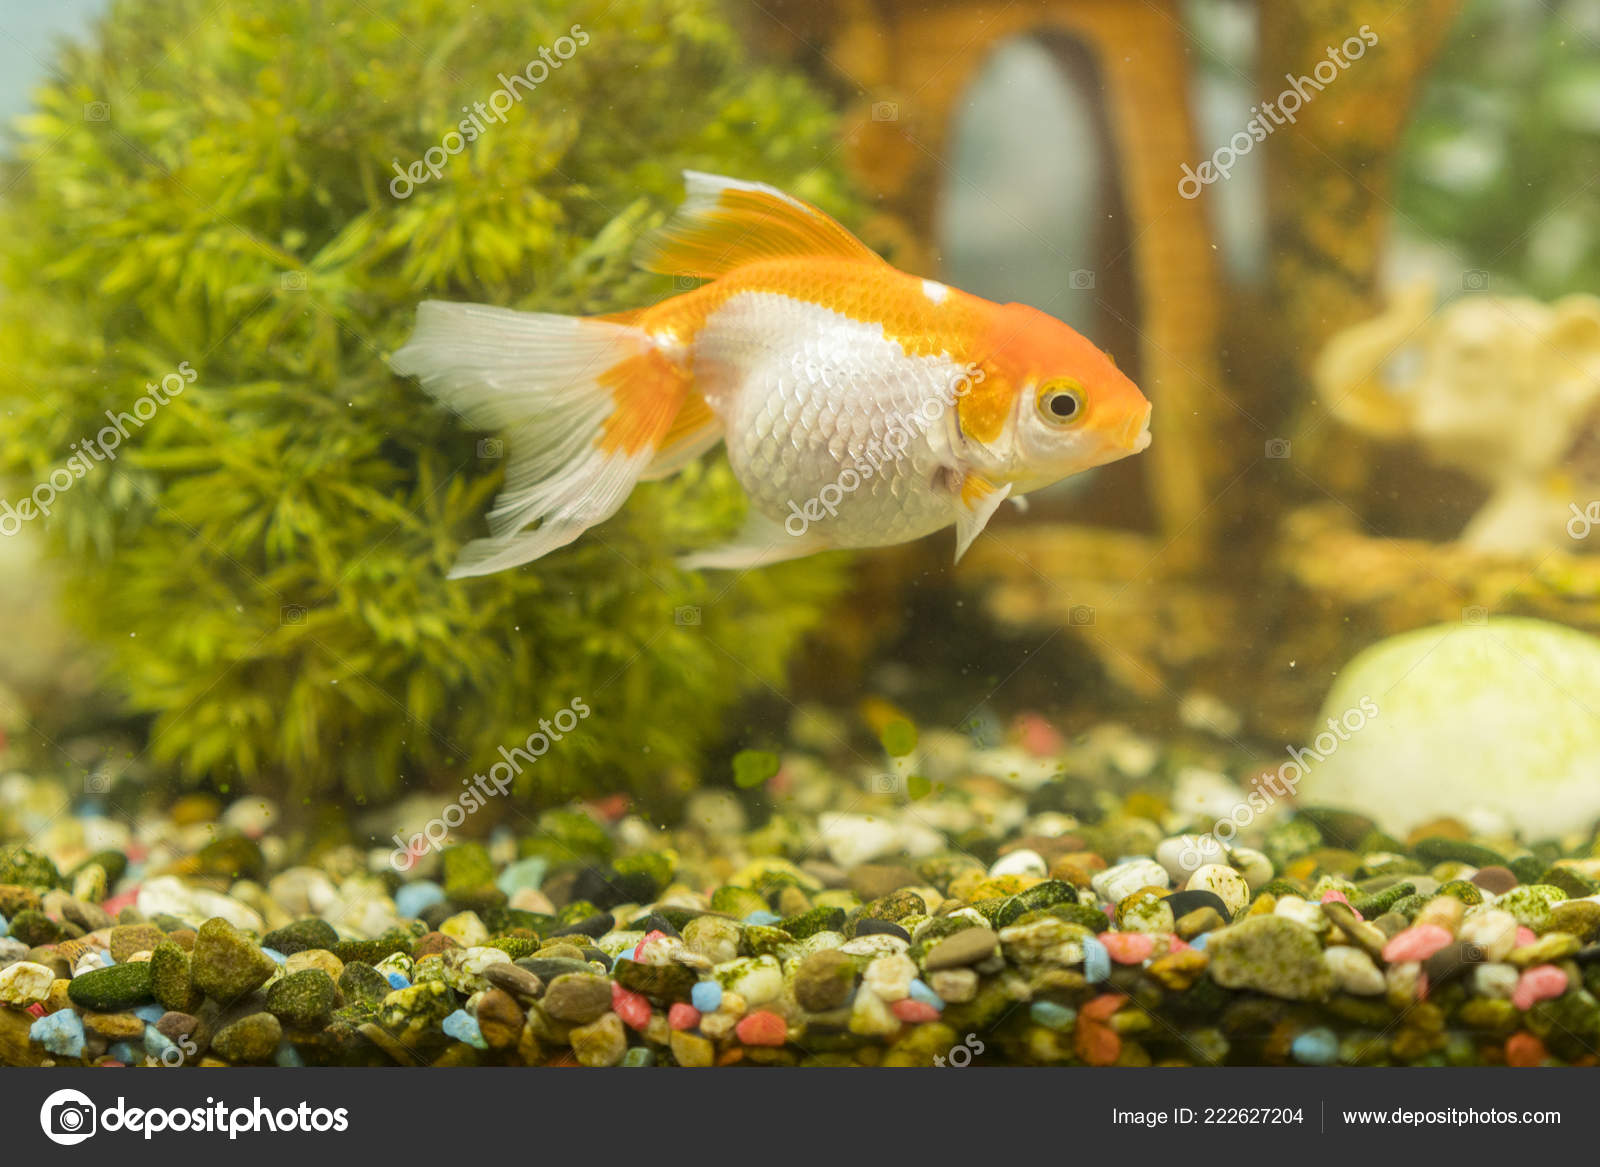 Pics Freshwater Aquarium Goldfish Freshwater Aquarium Green Beautiful Planted Tropical Fish Freshwater Aquarium Stock Photo C Colt Kiev Mail Ru 222627204